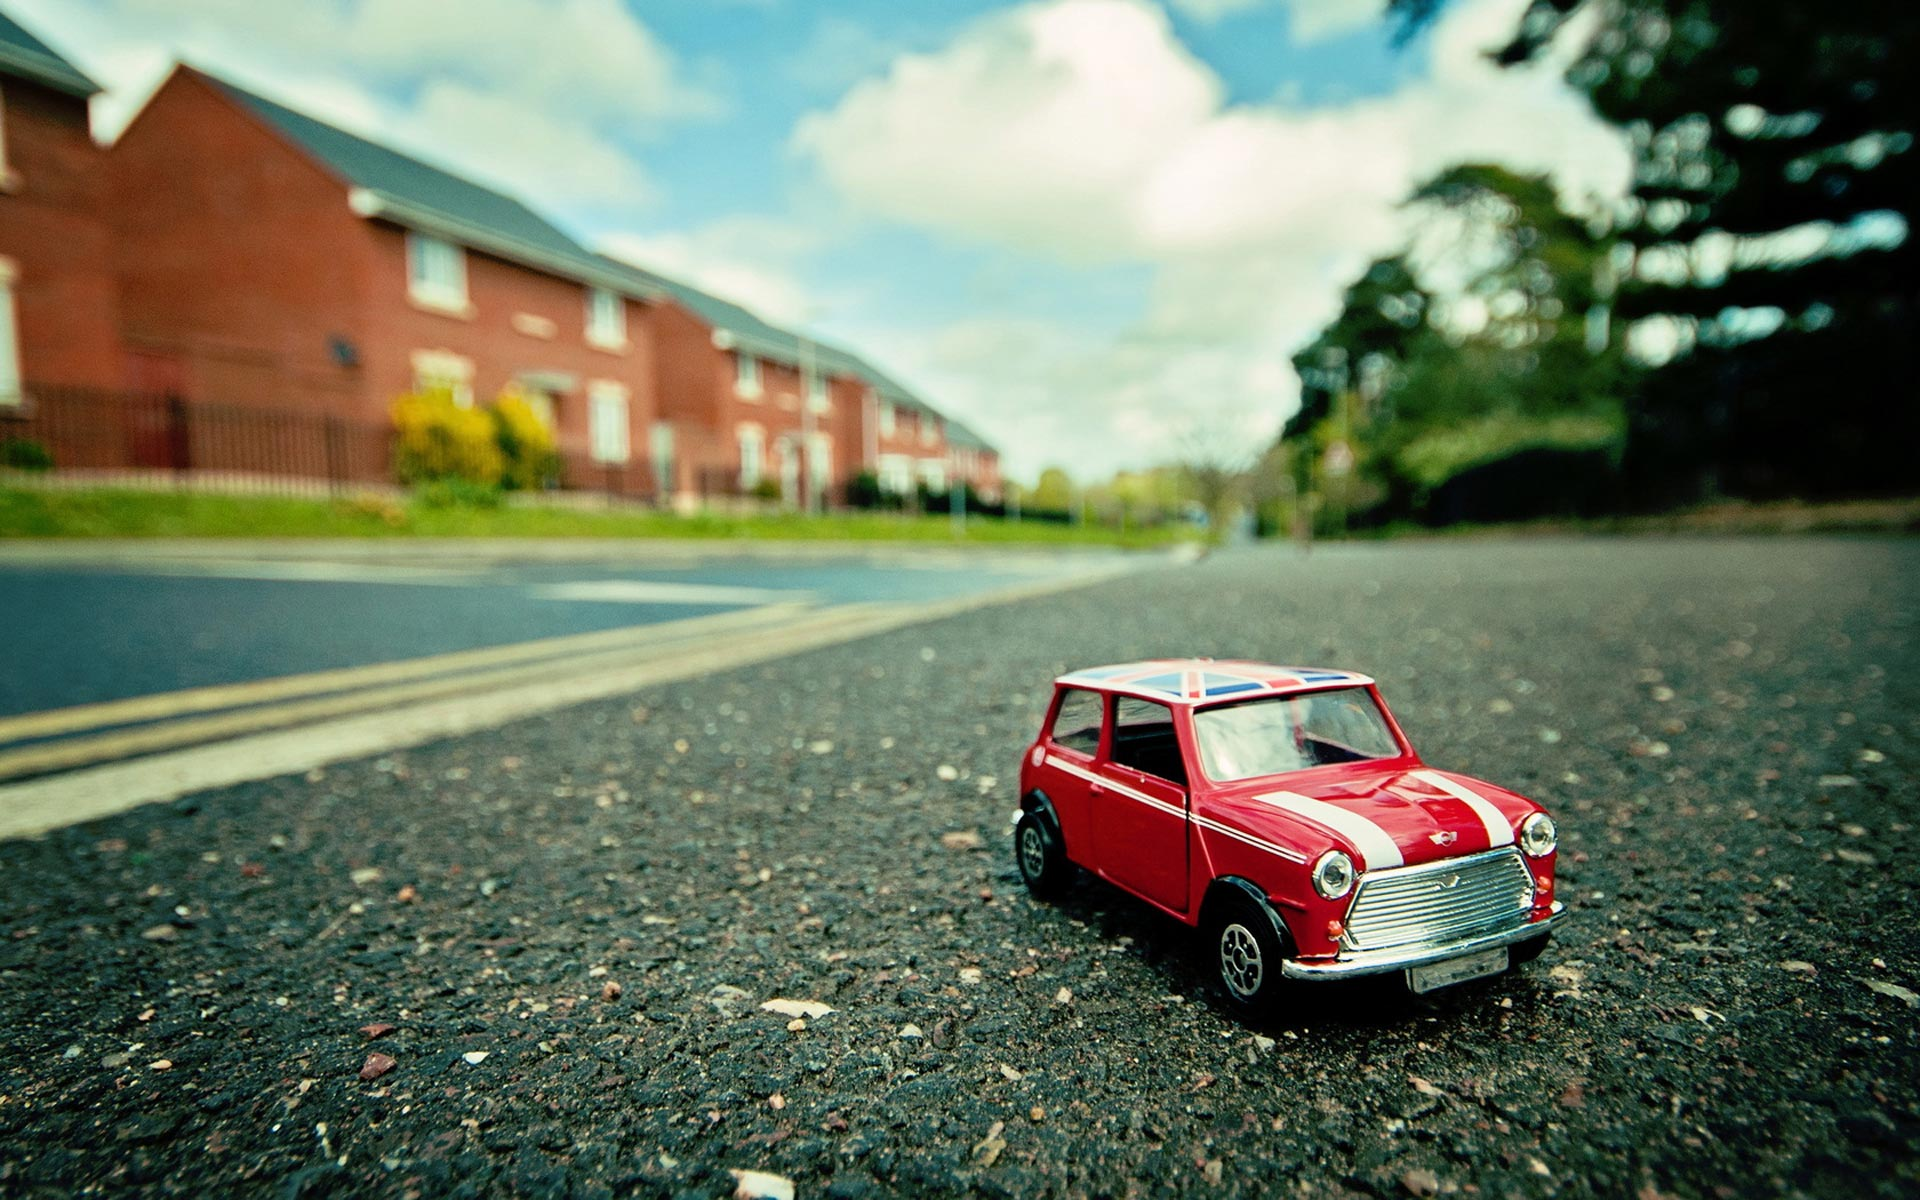 Toy Car Wallpaper